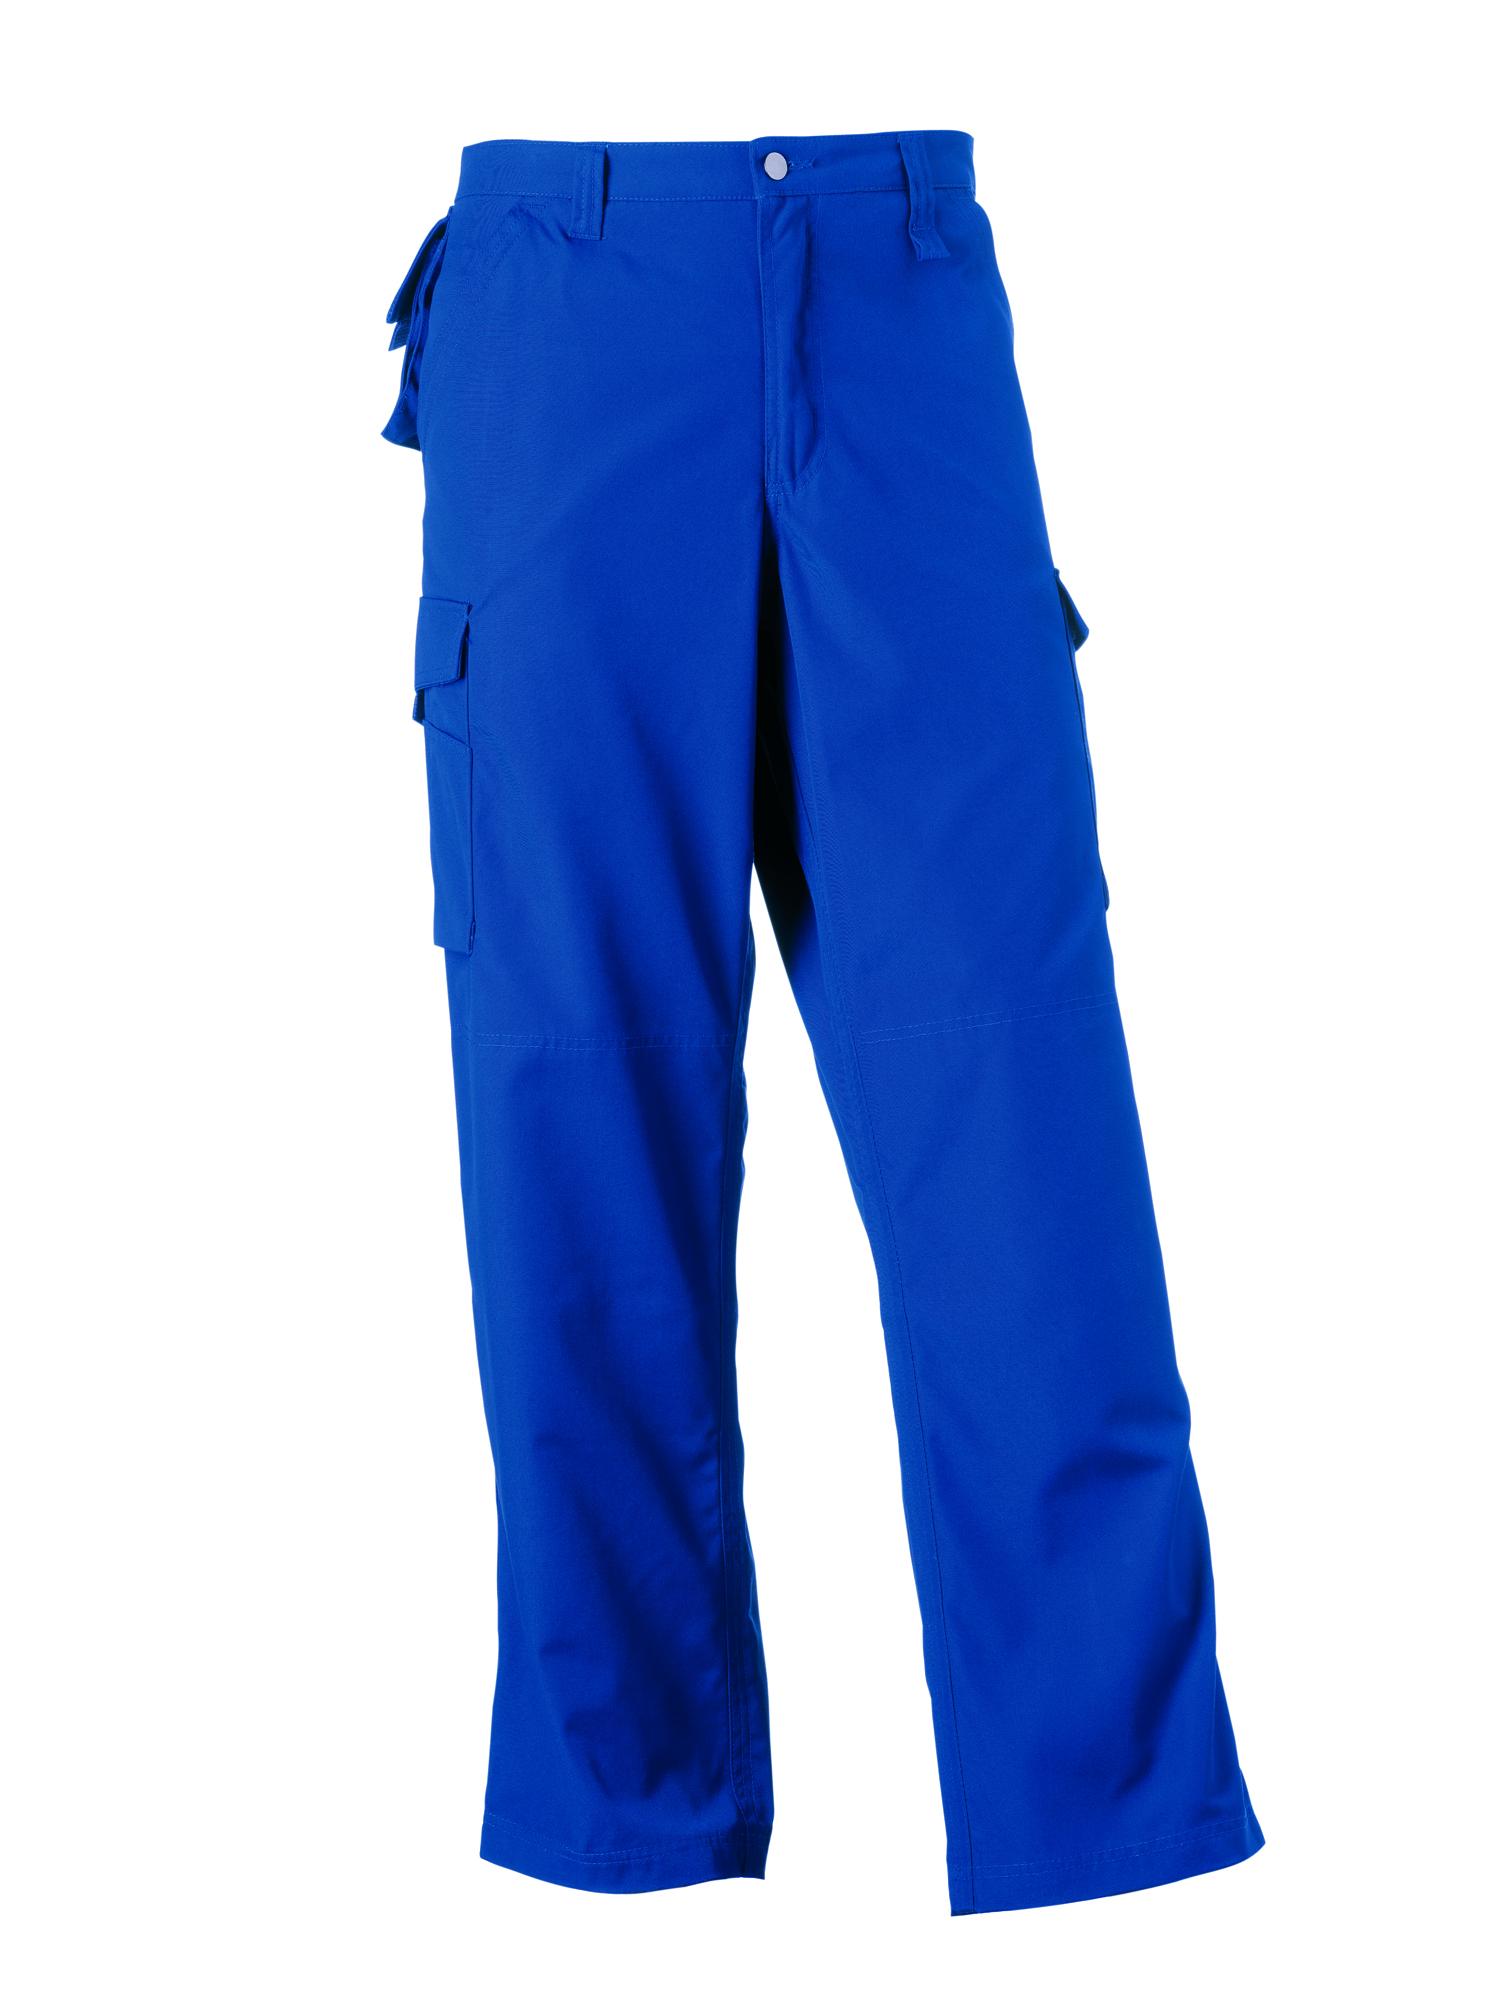 Heavy Duty Trousers  - Bright Royal - 44-30